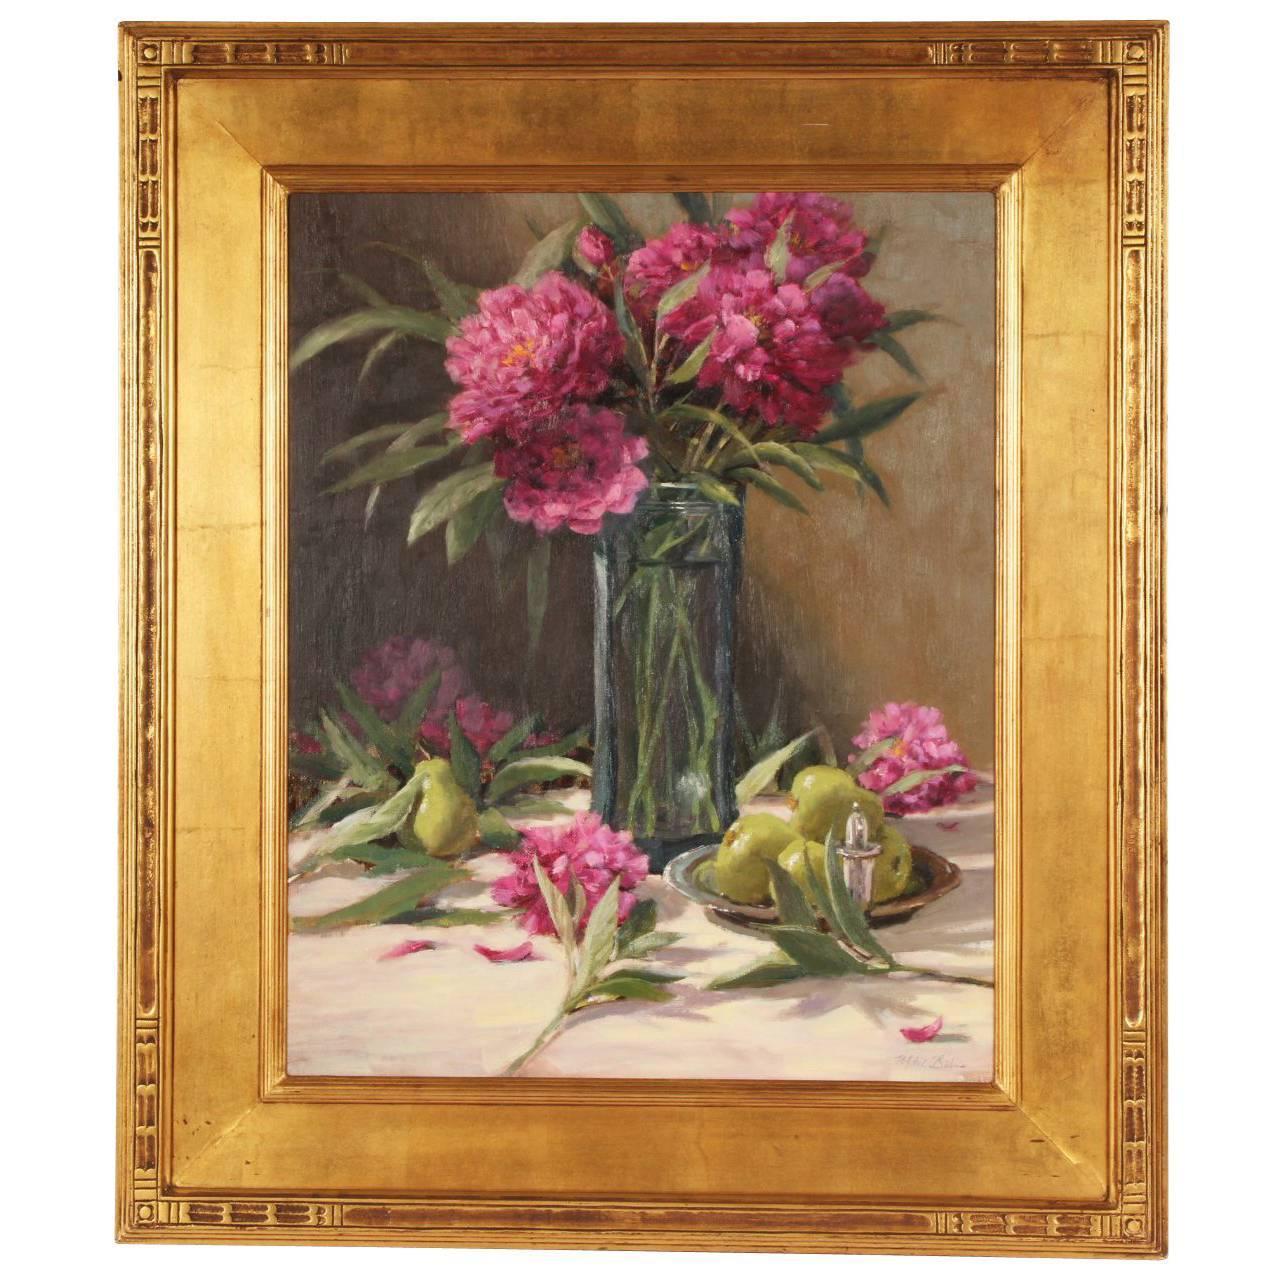 Mitch Bilis Oil on Canvas Still Life